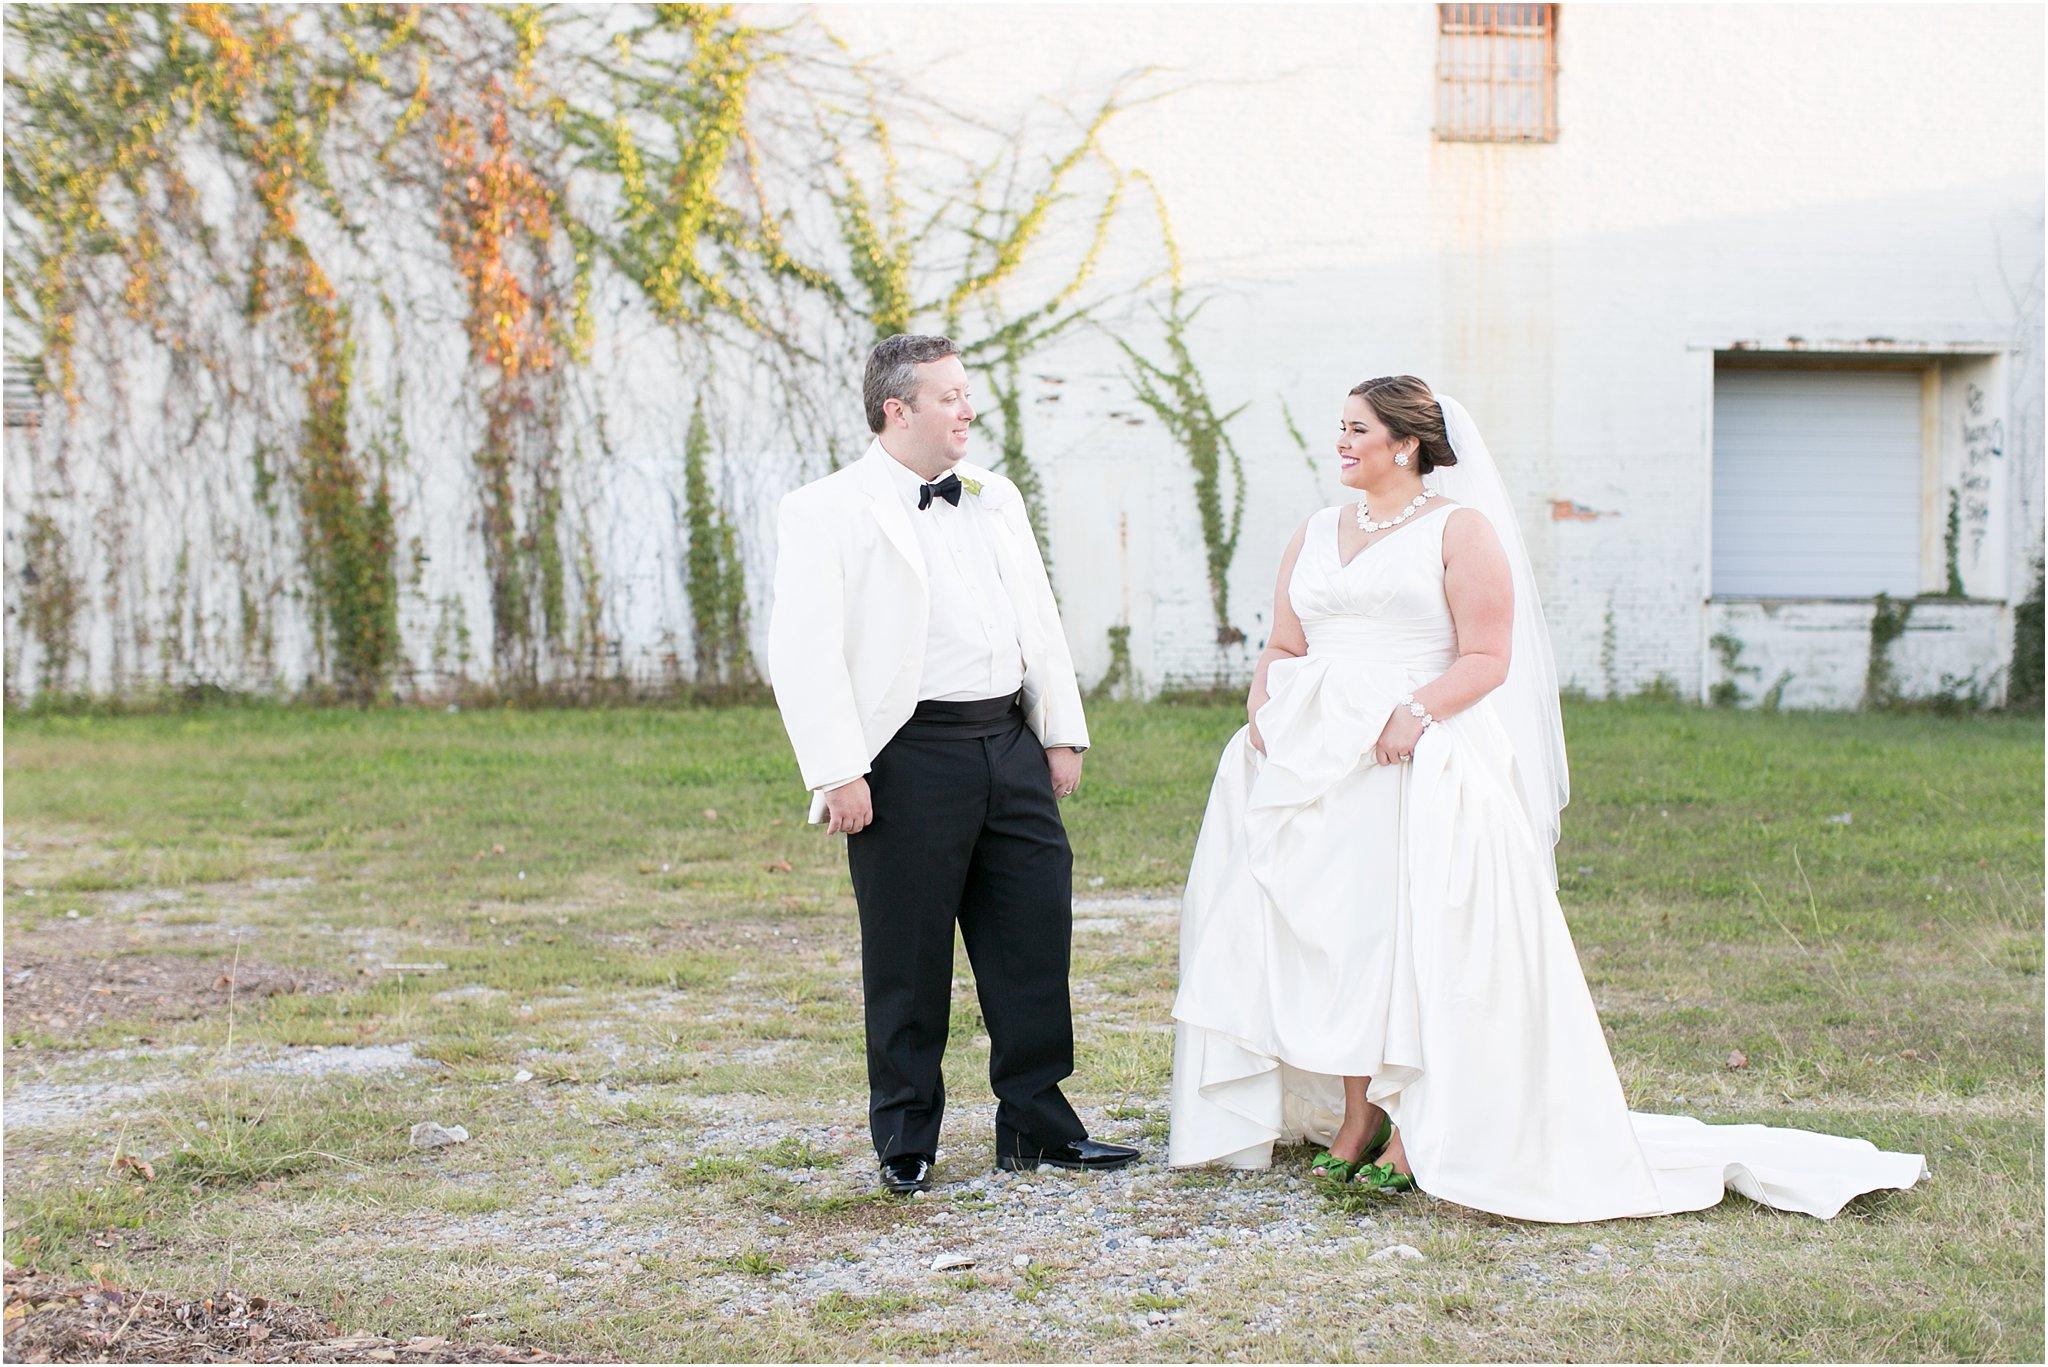 va_jessica_ryan_photography_virginia_wedding_norfolk_harrison_opera_house_norfolk_arts_district_portraits_3826